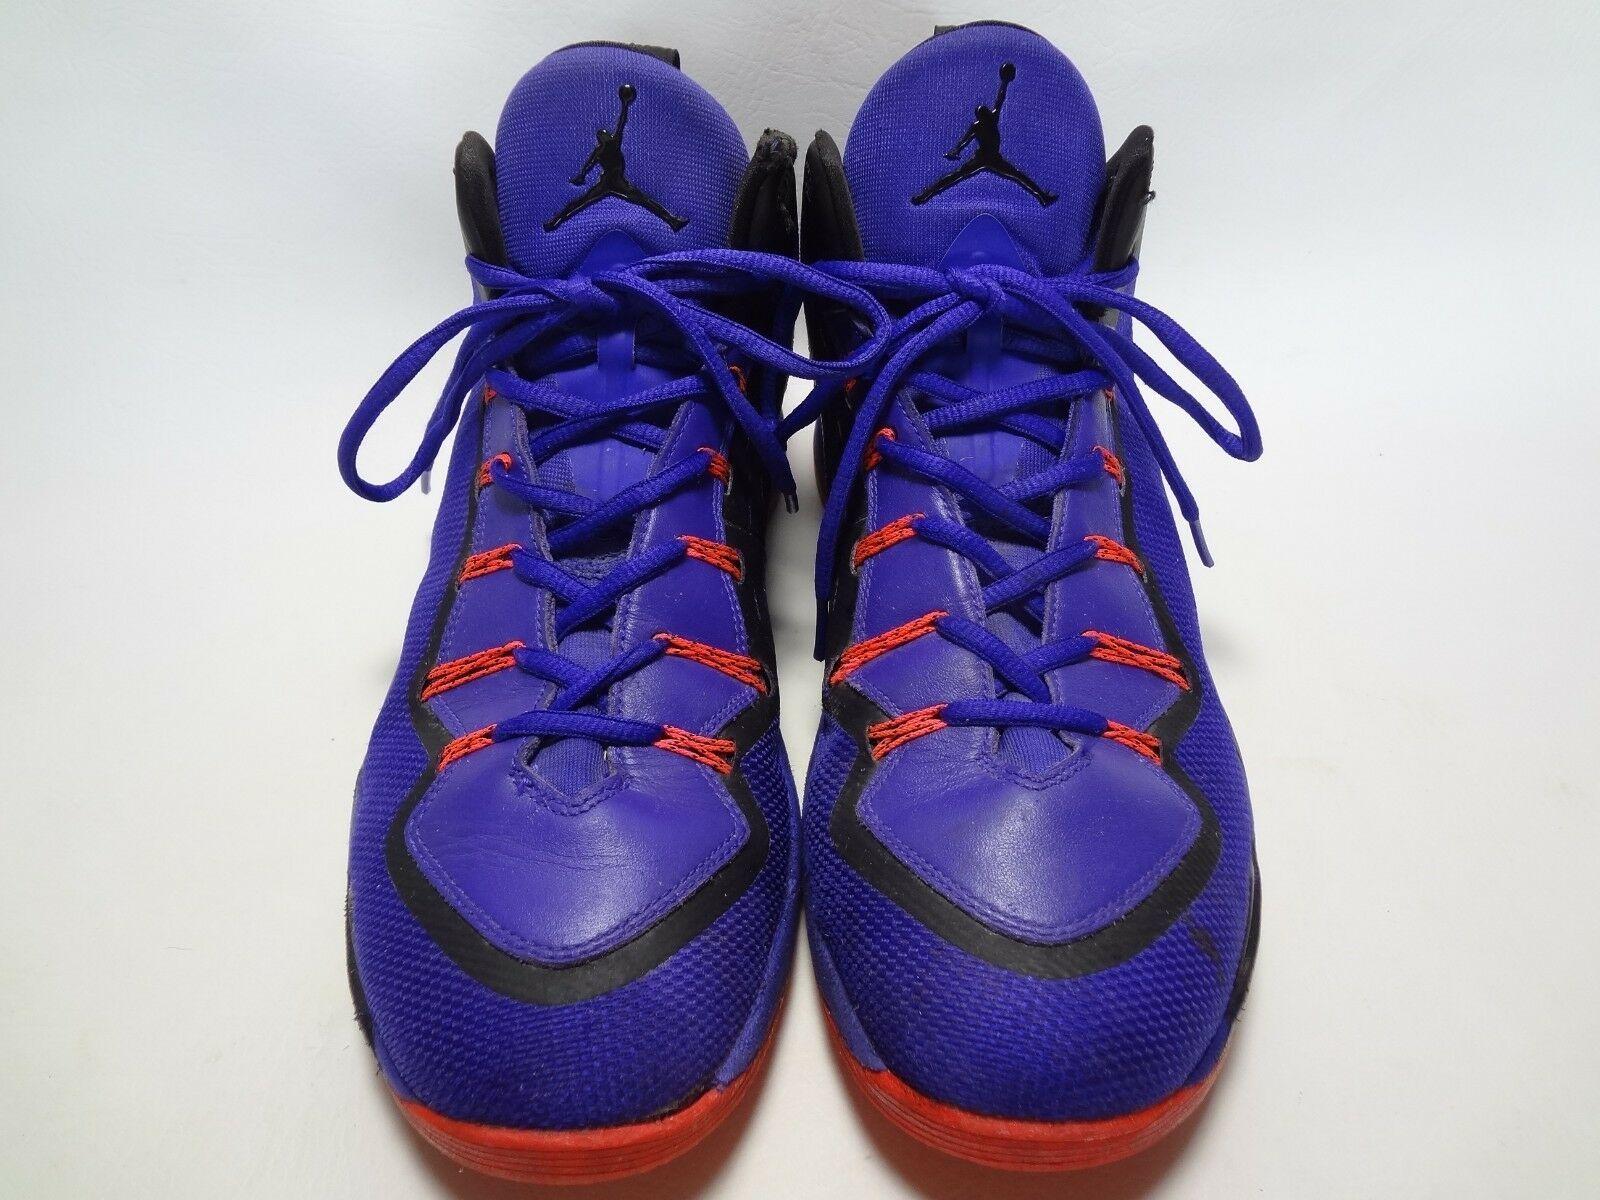 8059575538f47e Nike Air Jordan Super Fly 2 PO Playoffs Concord Blck Infrared 645058-523  11.5